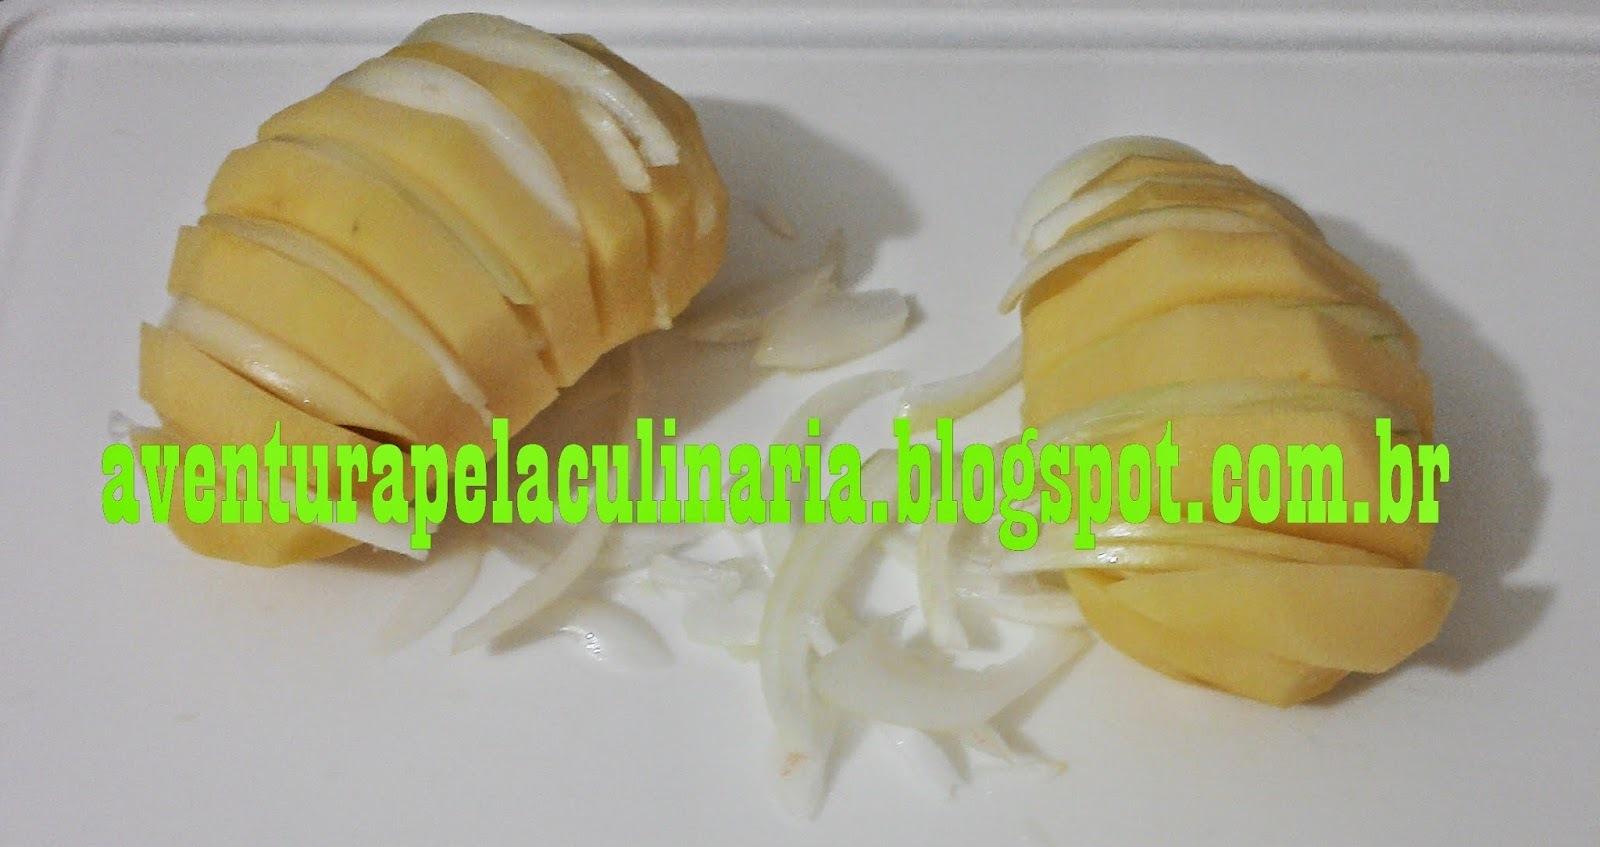 Lombo suíno assado com batatas laminadas (tipo hasselback)